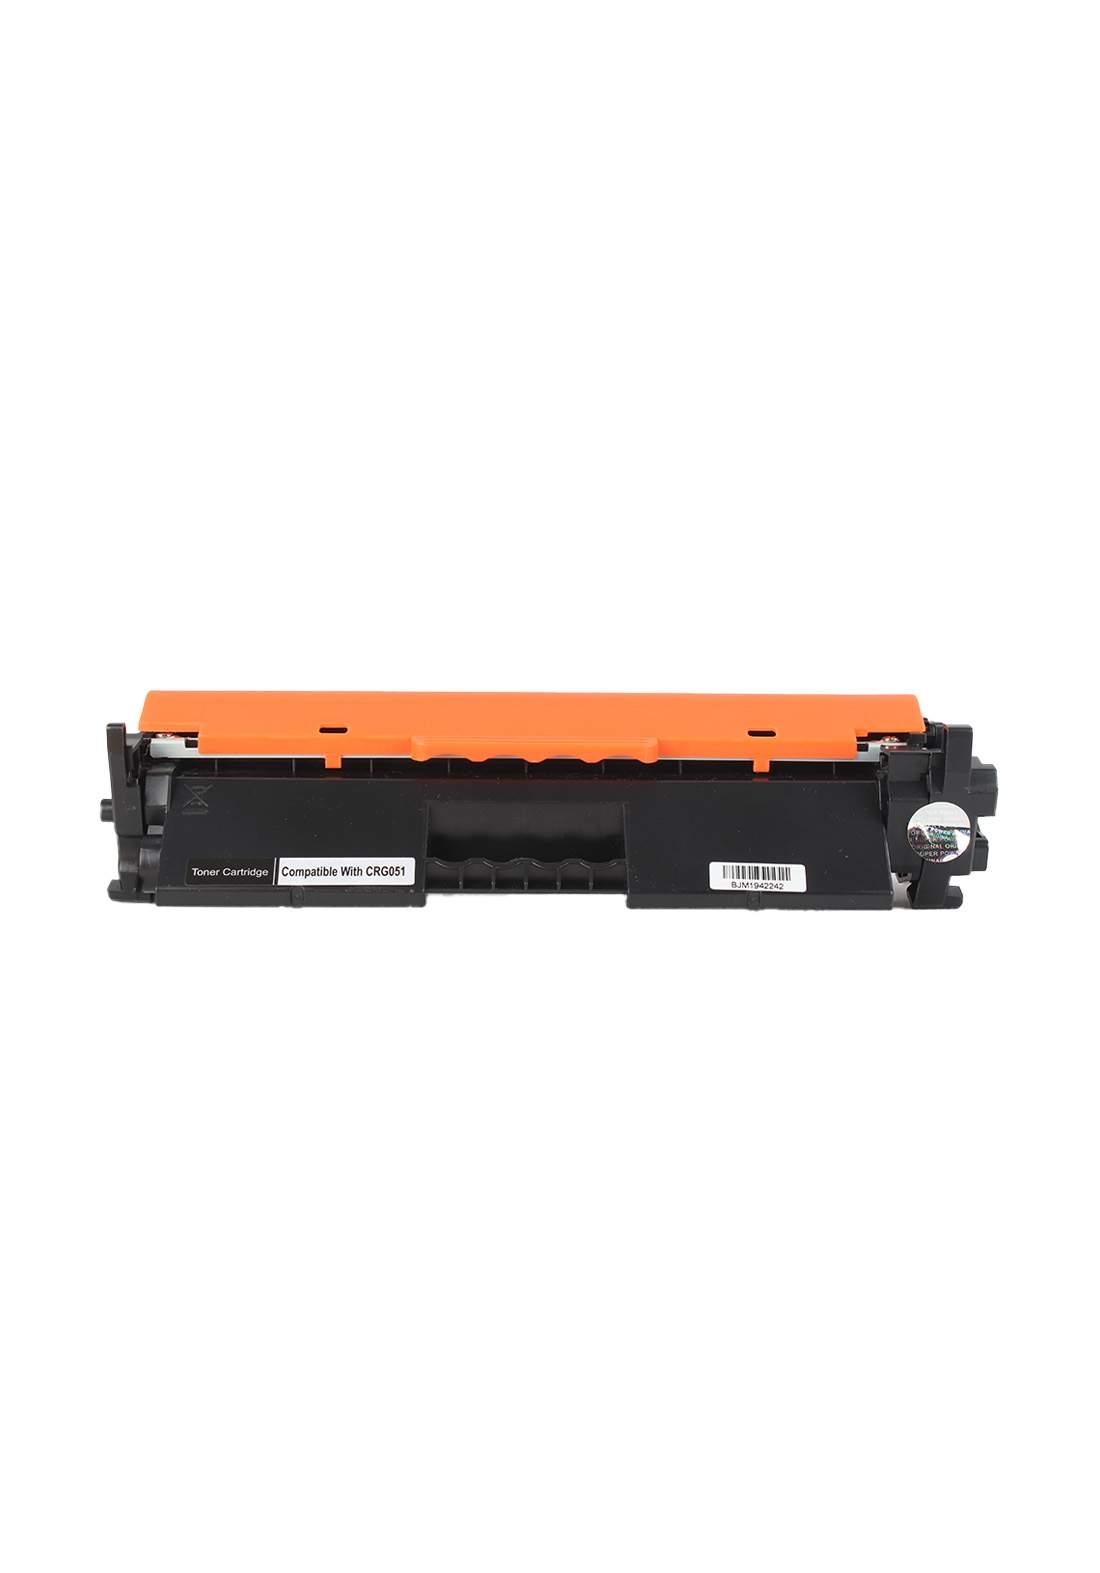 Super Power Plus CRG 051 Laser Printer Toner Cartridge خرطوشة حبر